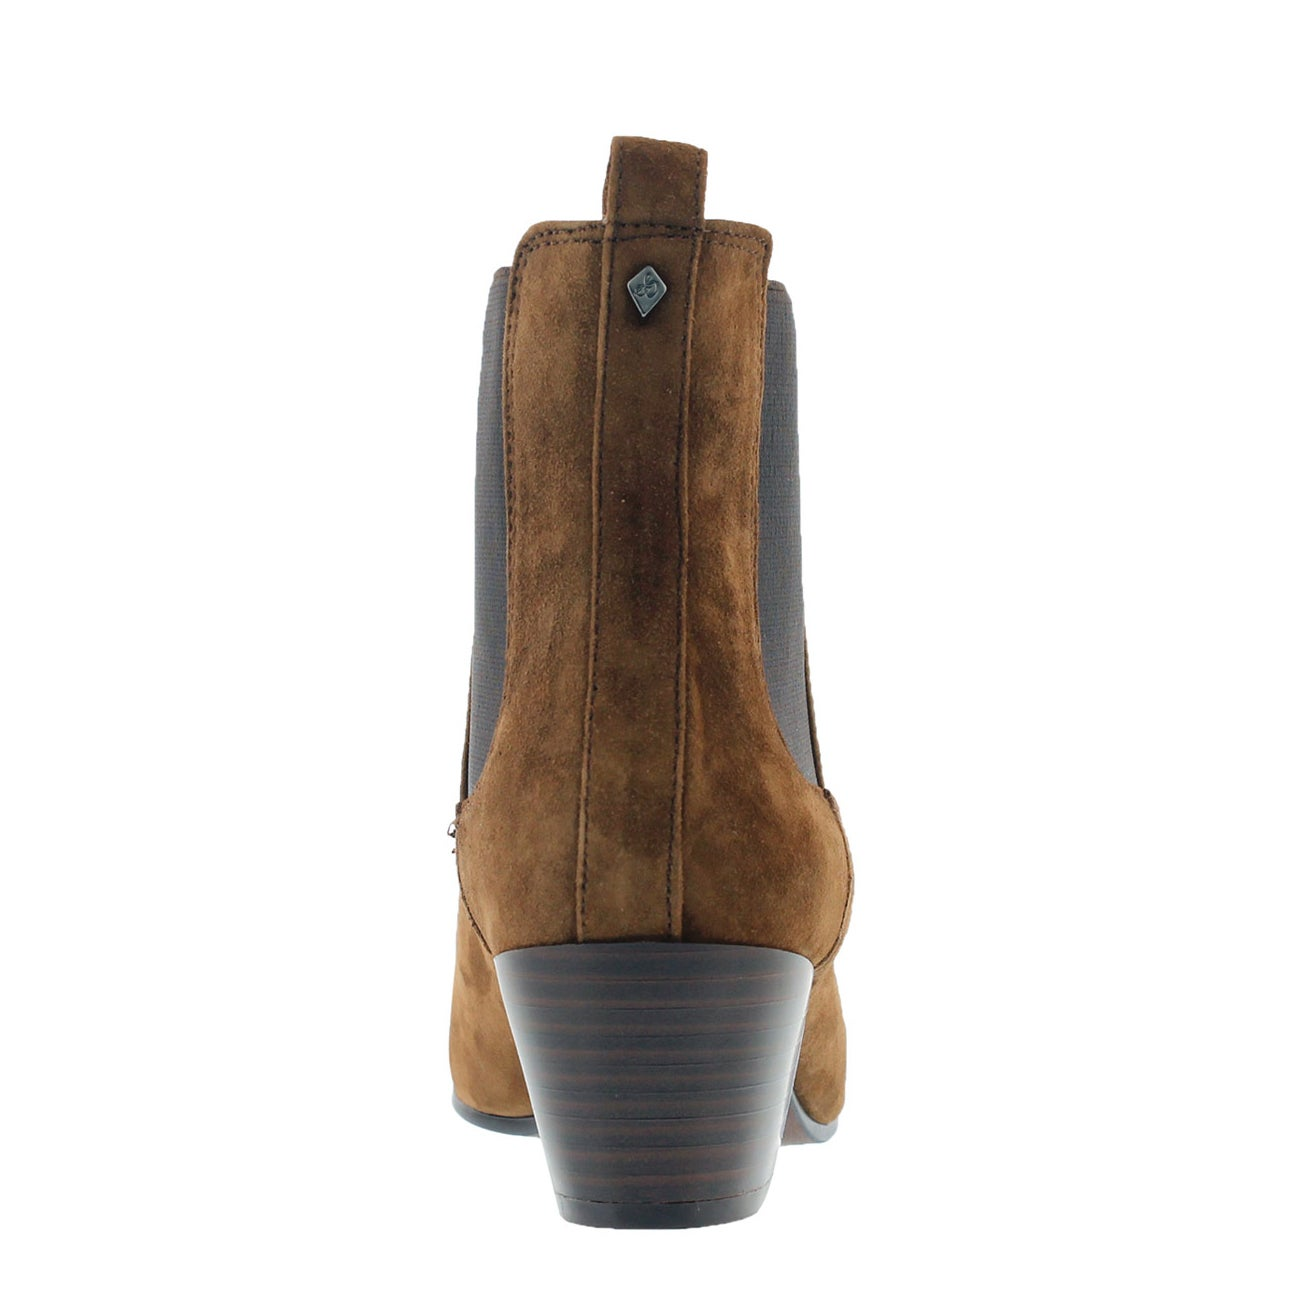 Lds Reesa brown suede slip on bootie